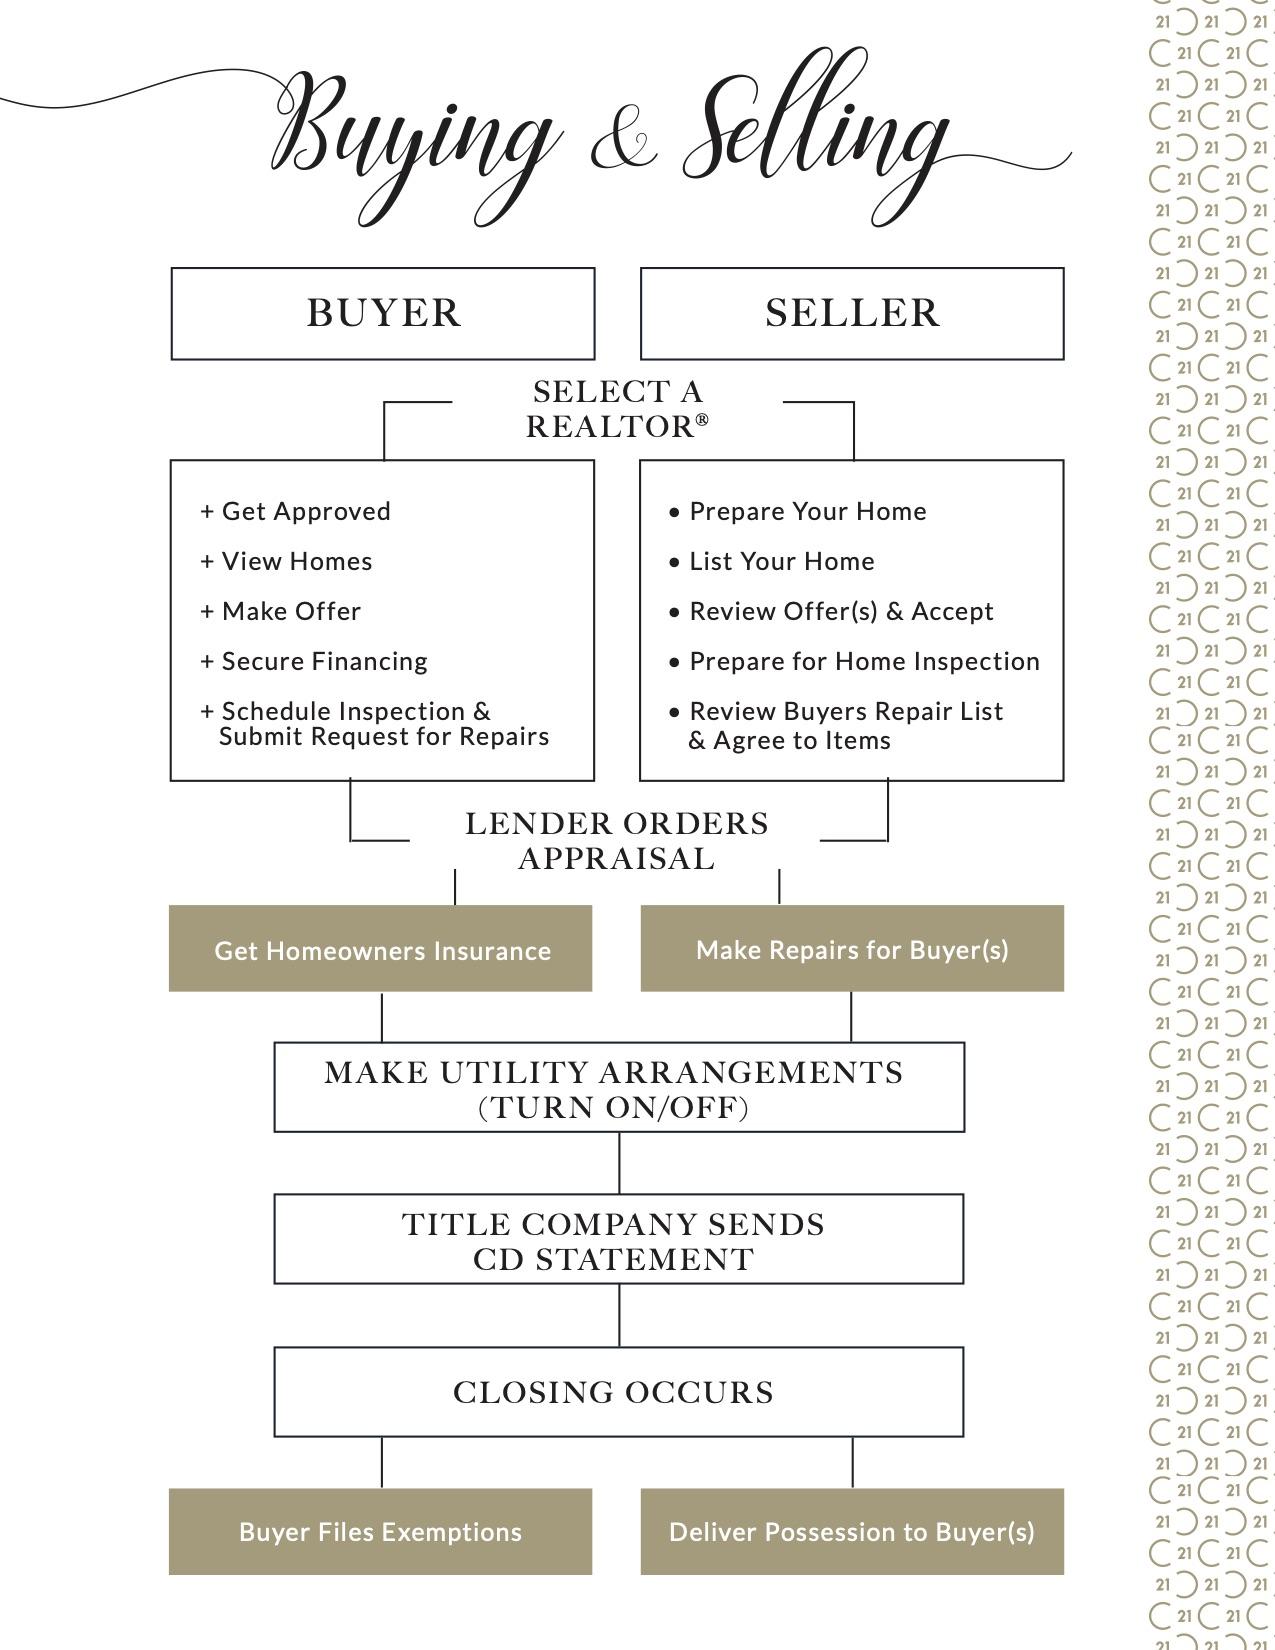 Spillman_Marketing Advantage[2] copy